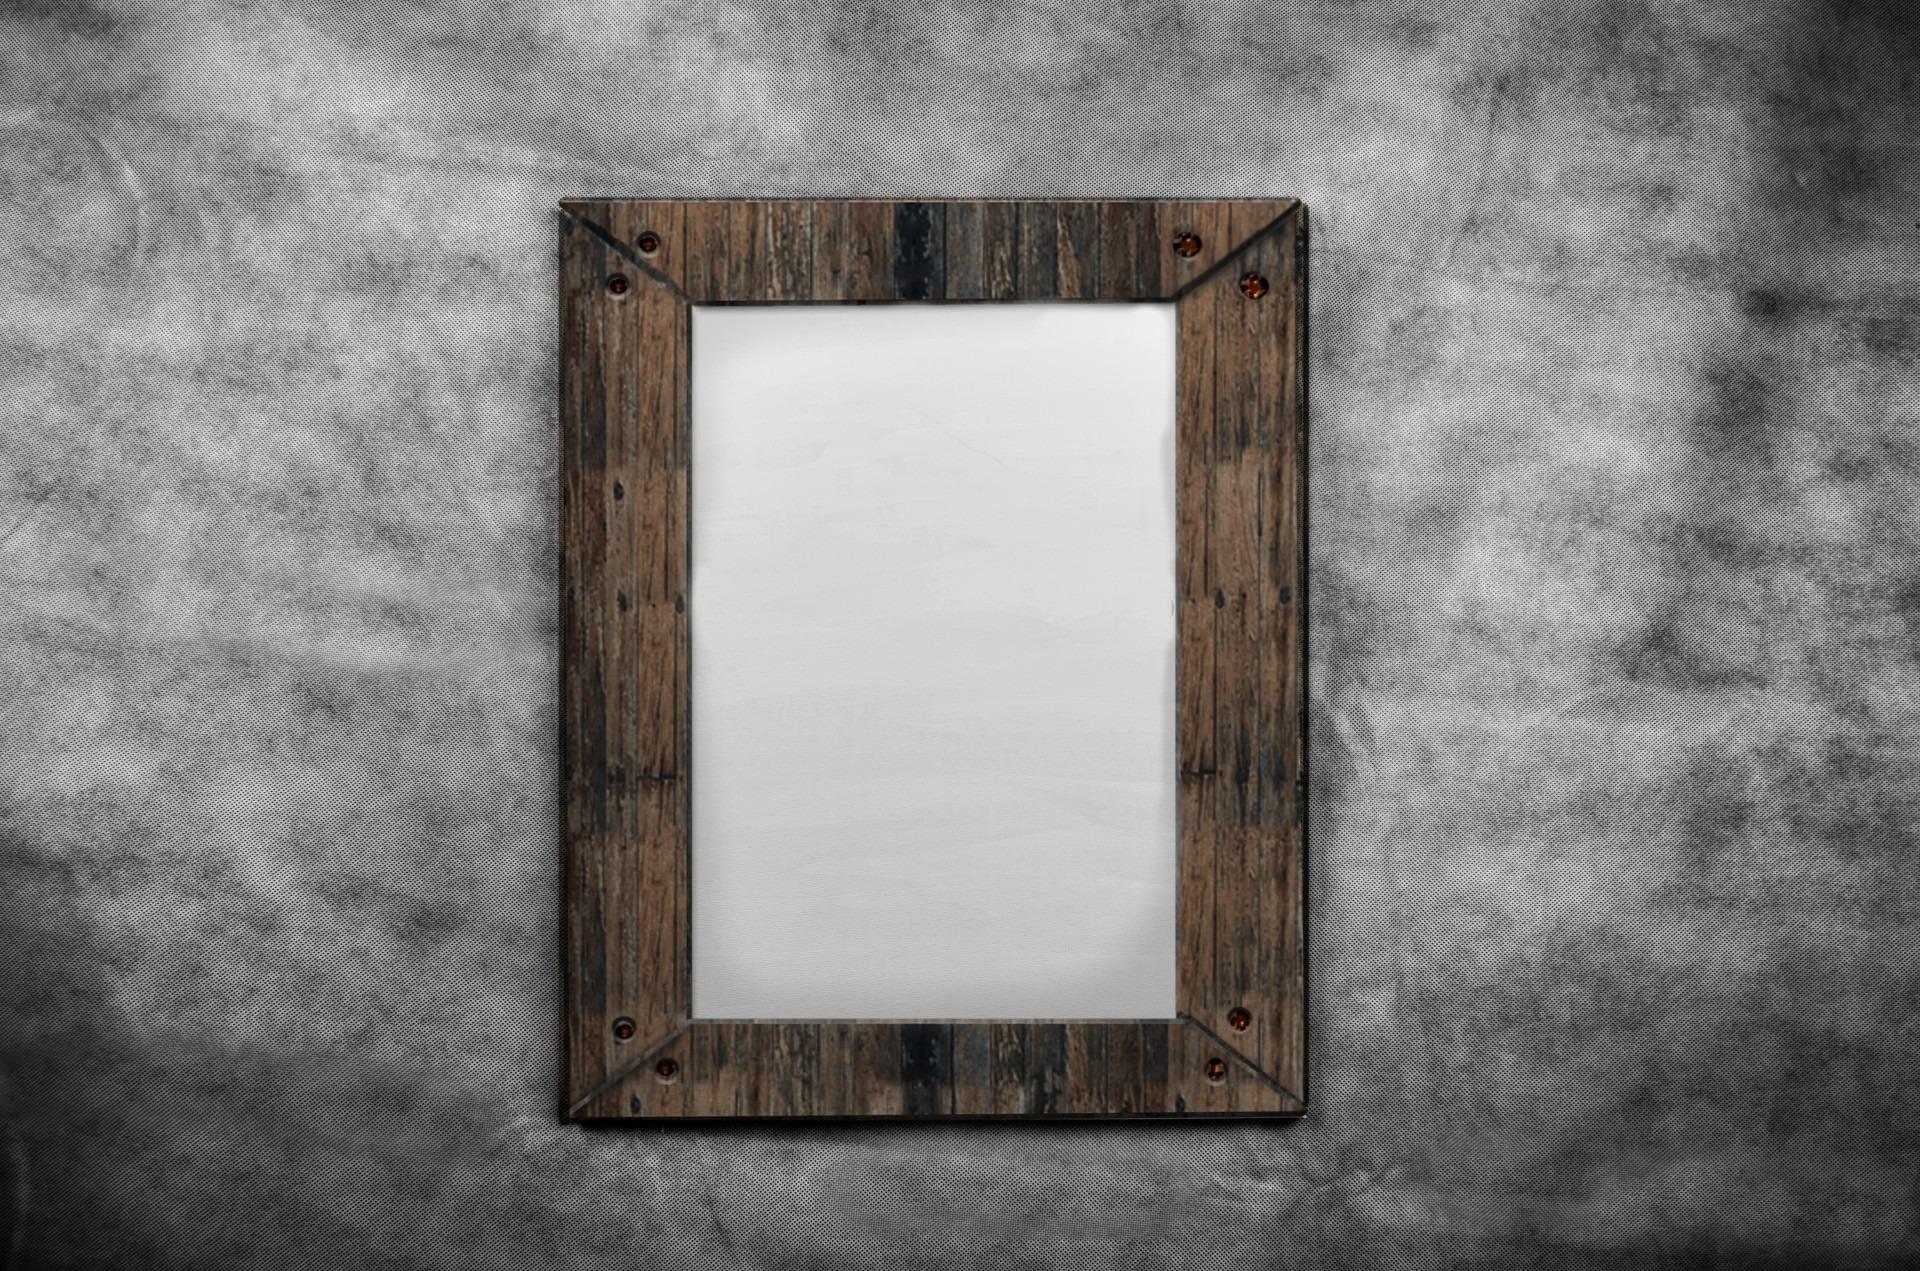 Creative Framing Ideas